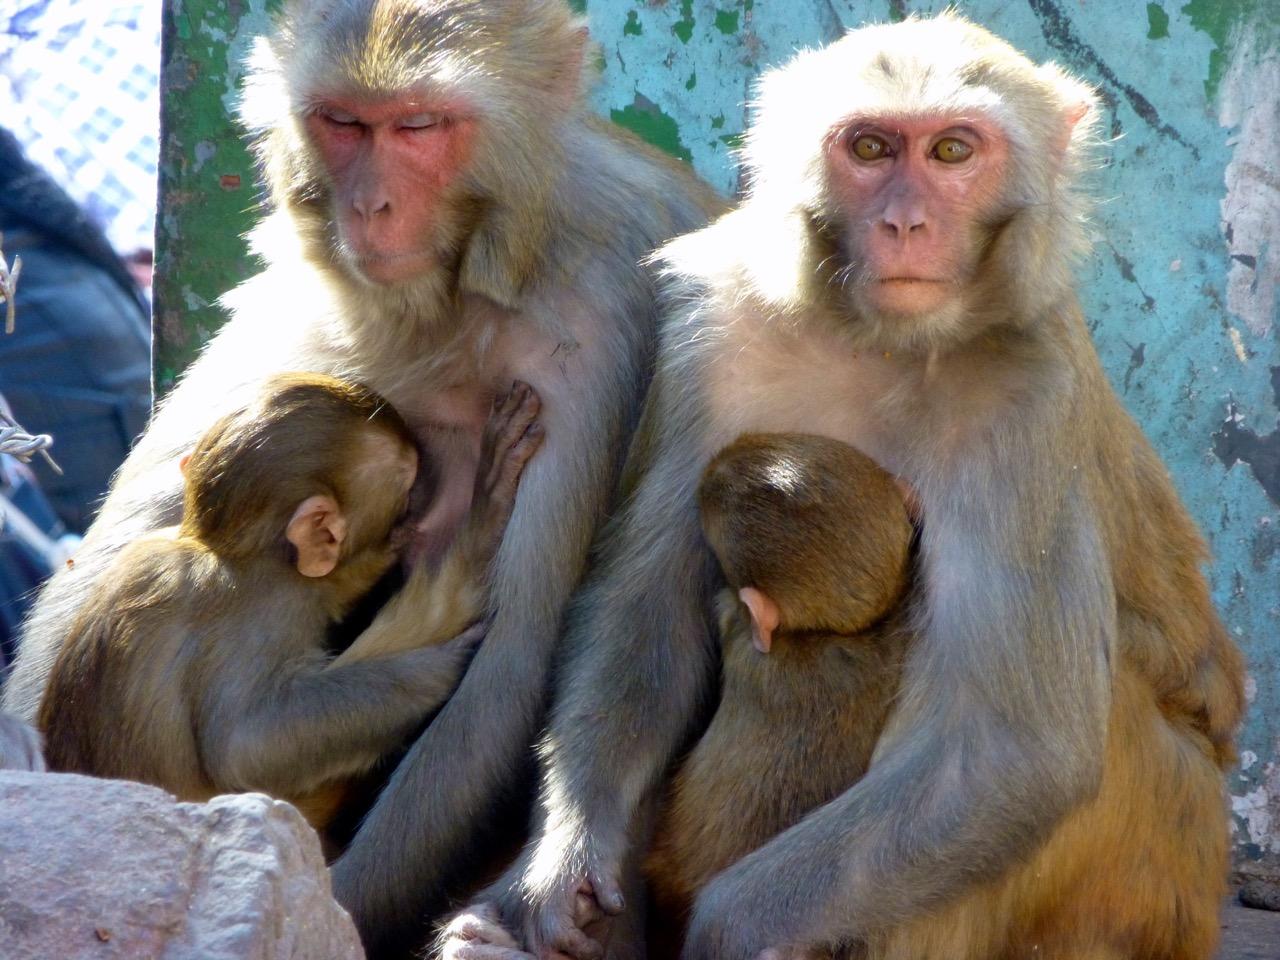 Monkeys, monkeys everywhere!